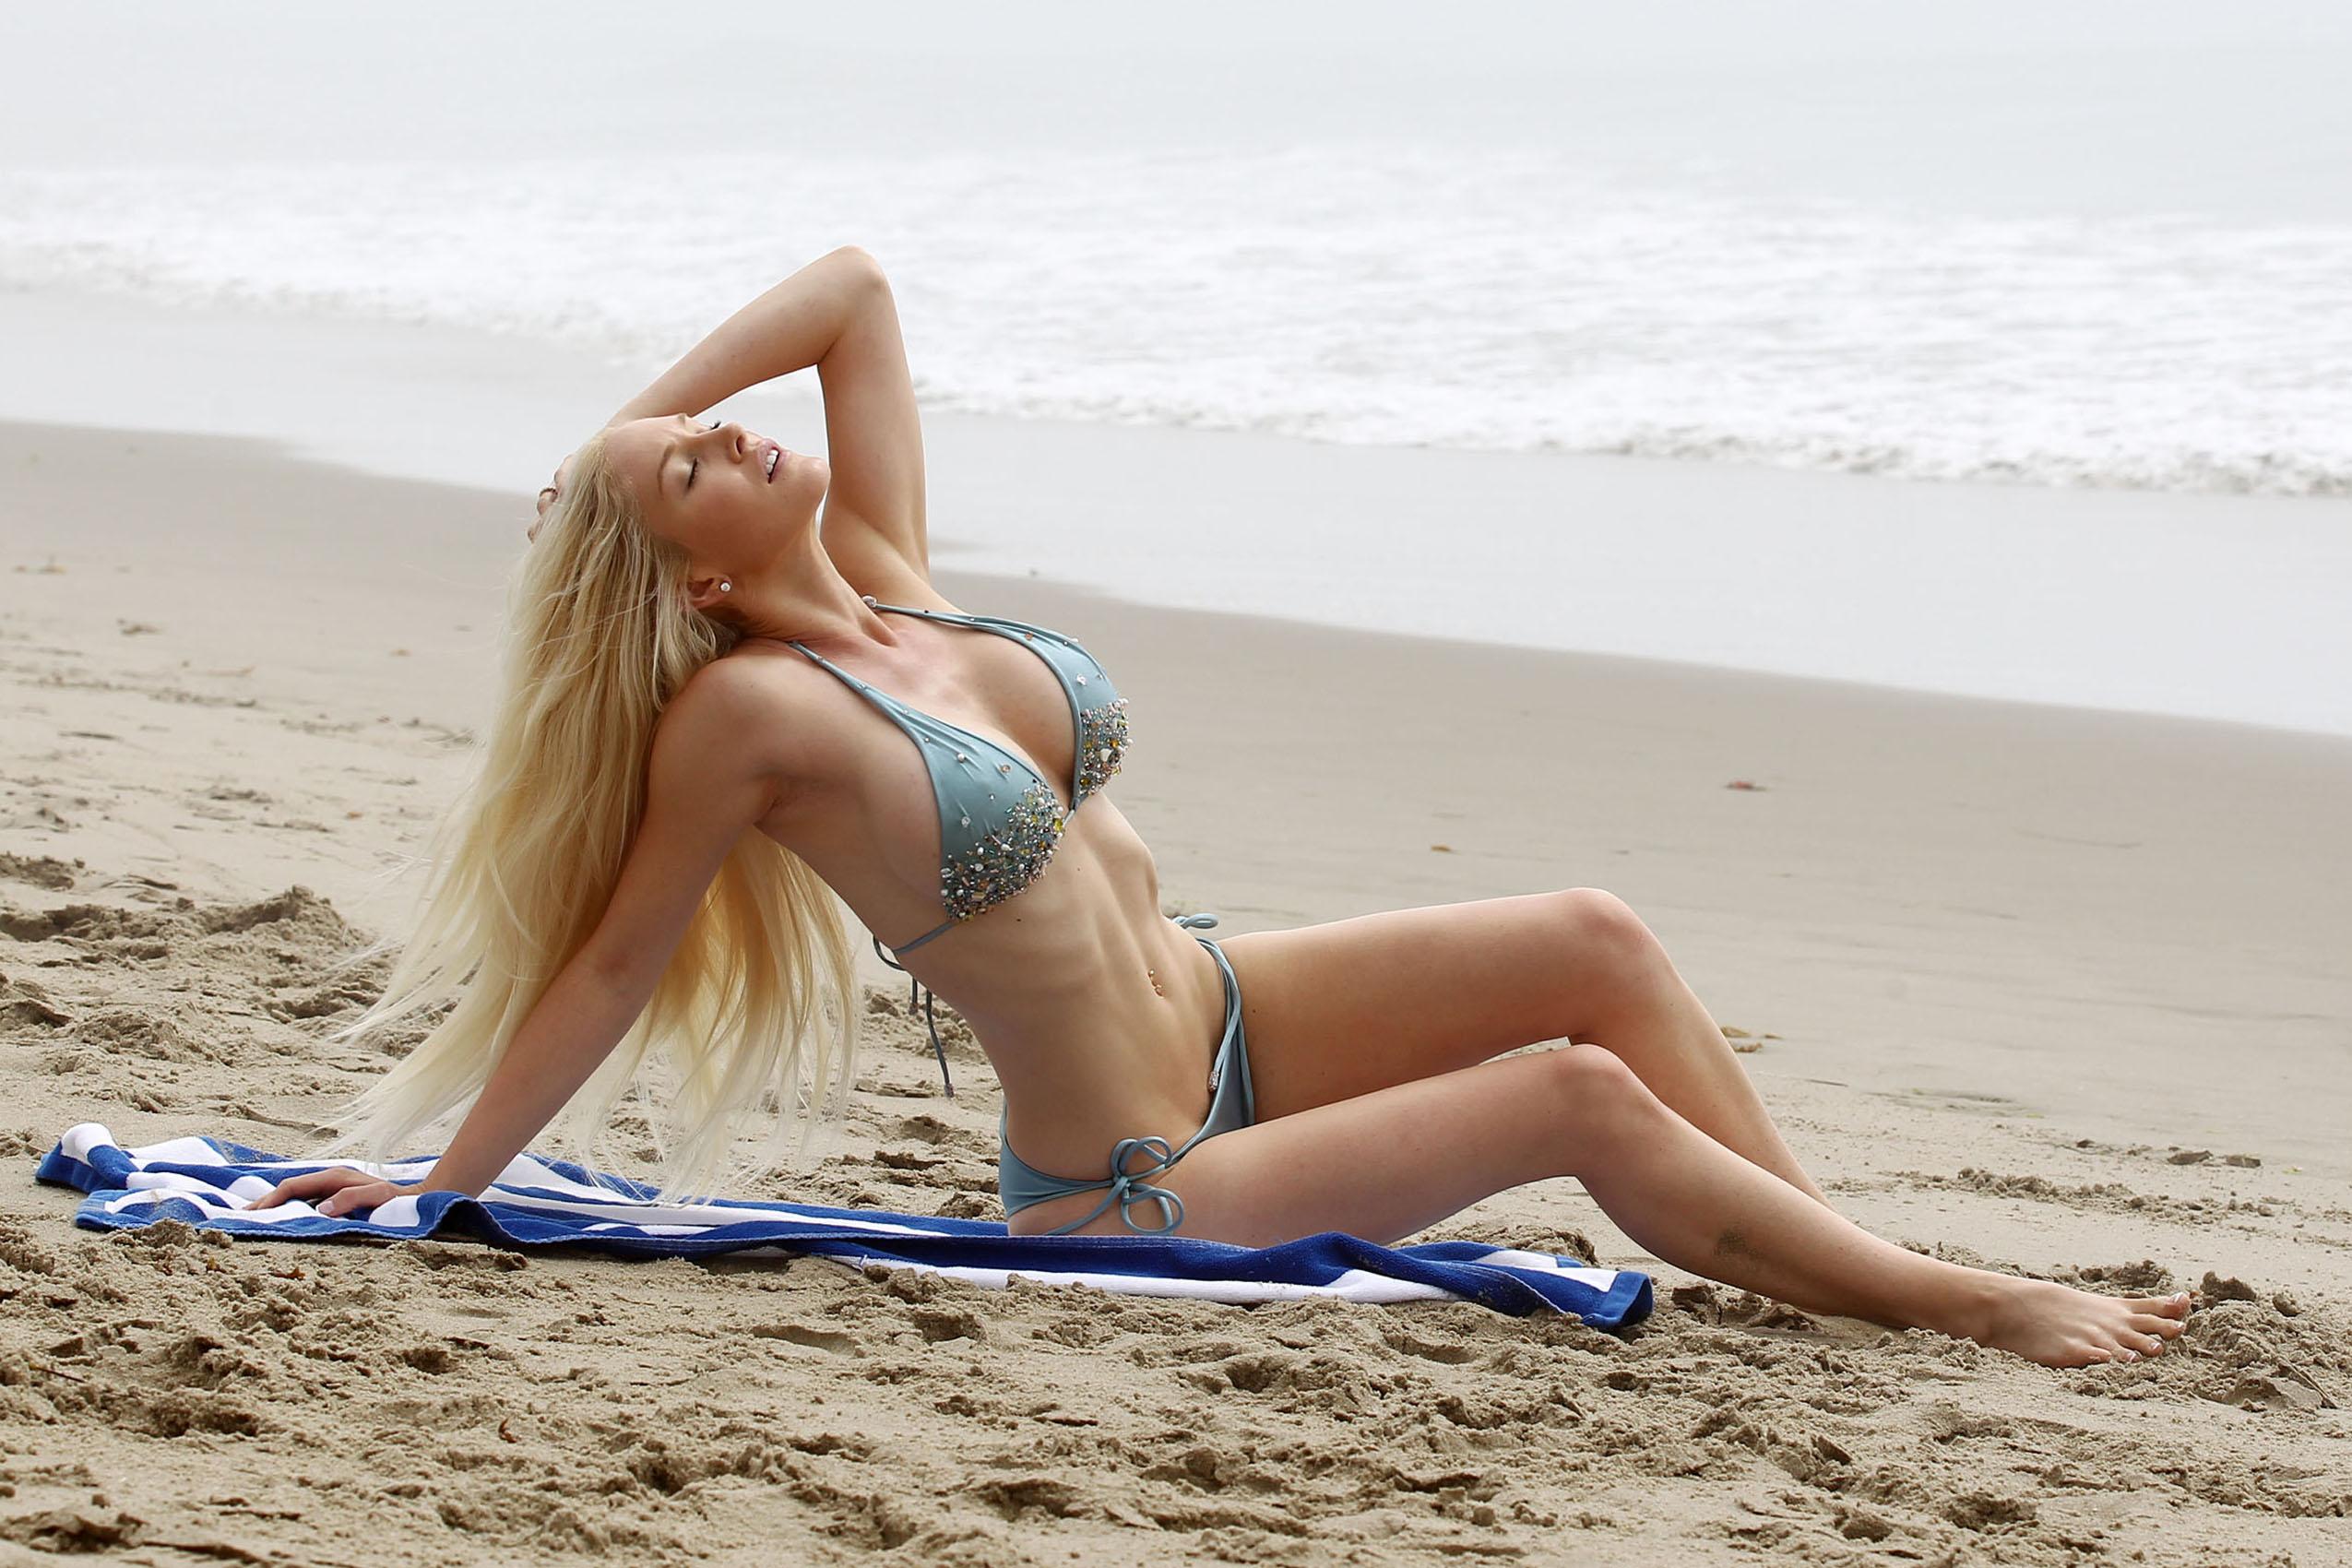 Regret, Heidi montag bikini join. agree